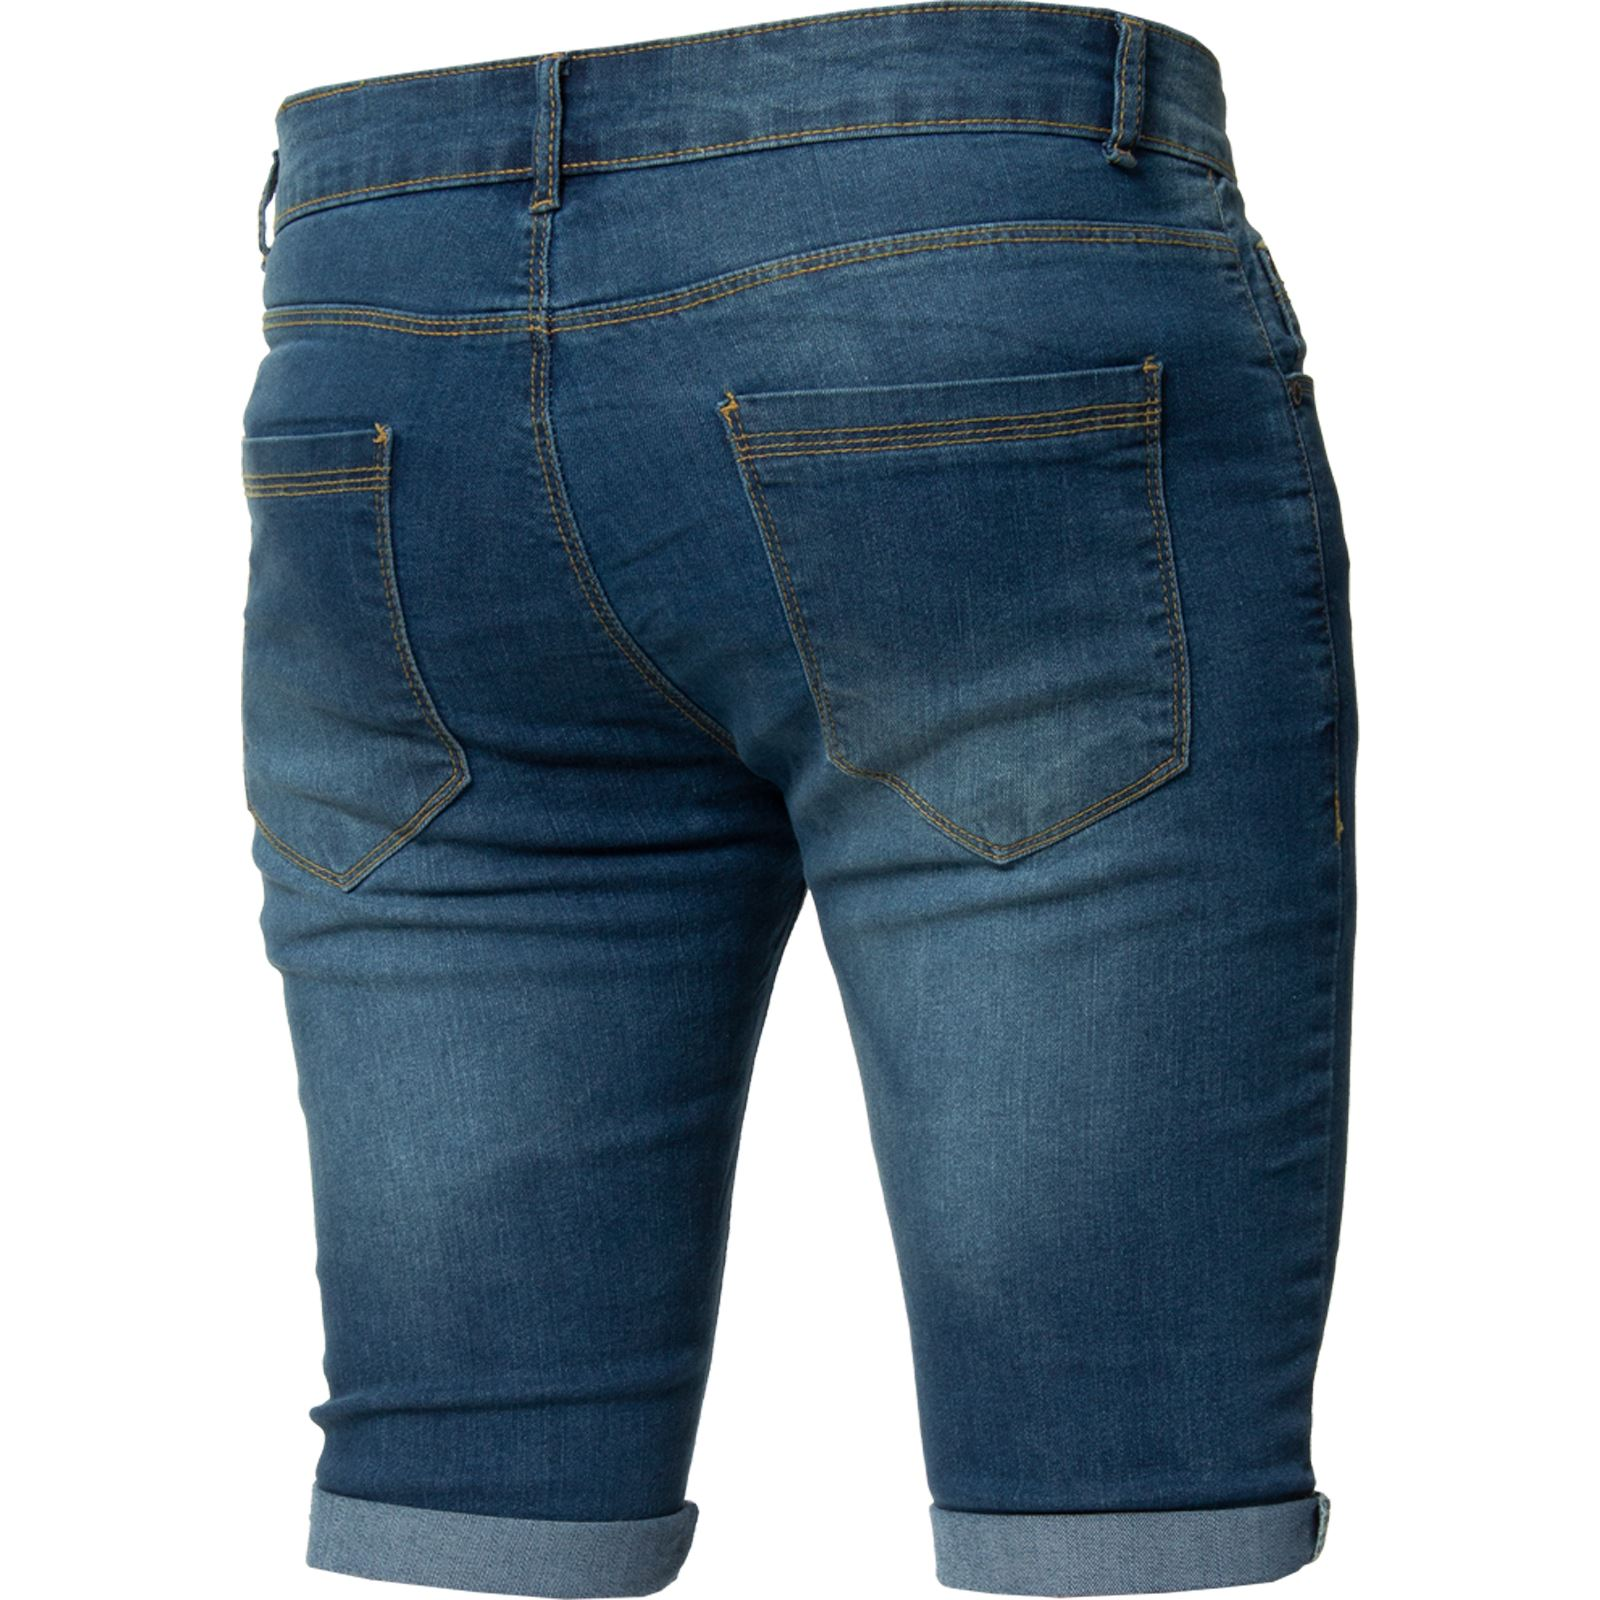 c2b731b5712 Kruze Mens Skinny Slim Fit Stretch Ripped Shorts Summer Denim Half ...